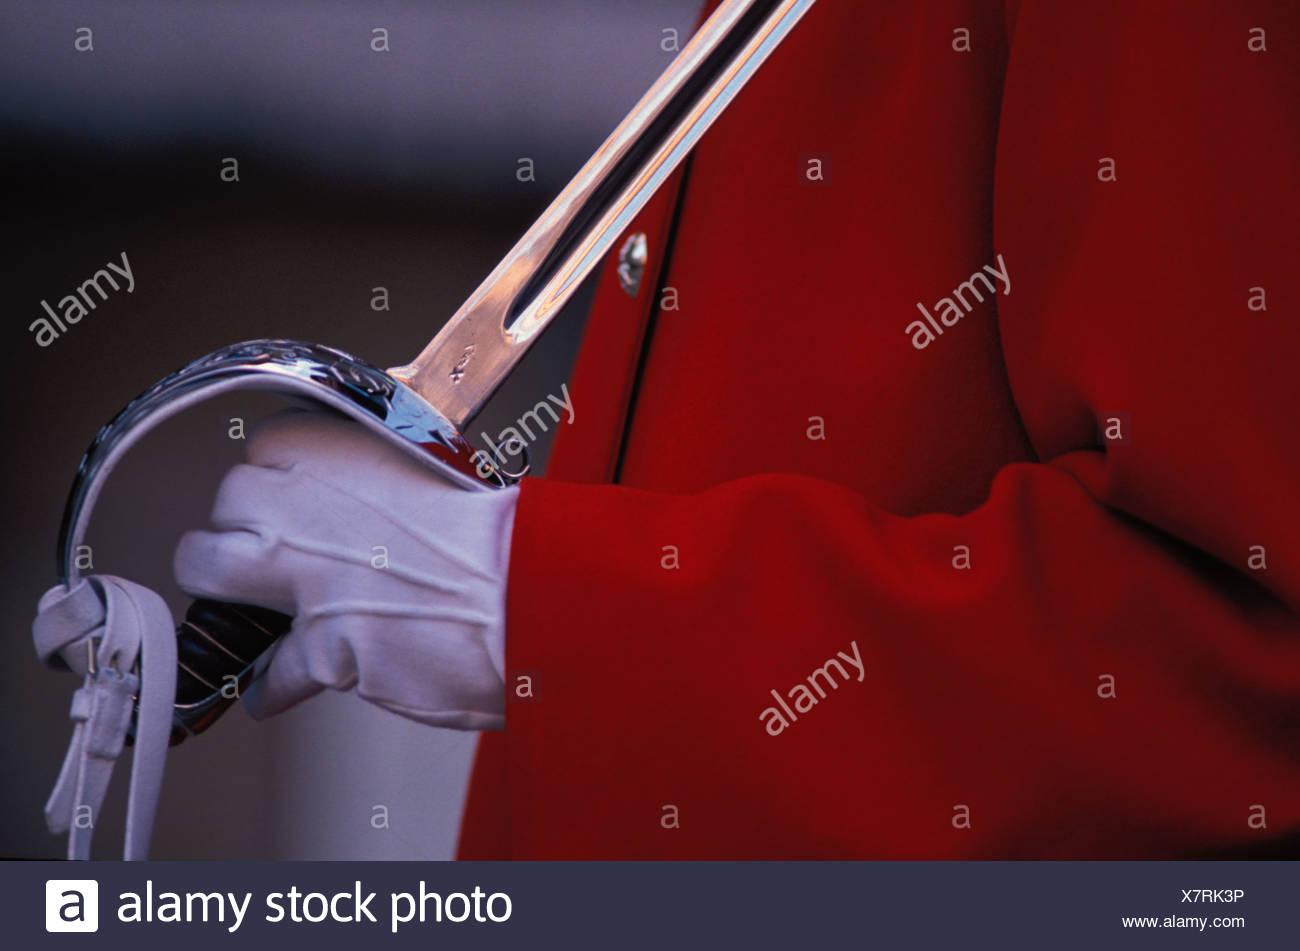 Soldier in Dress Uniform Holding Sword - Stock Image